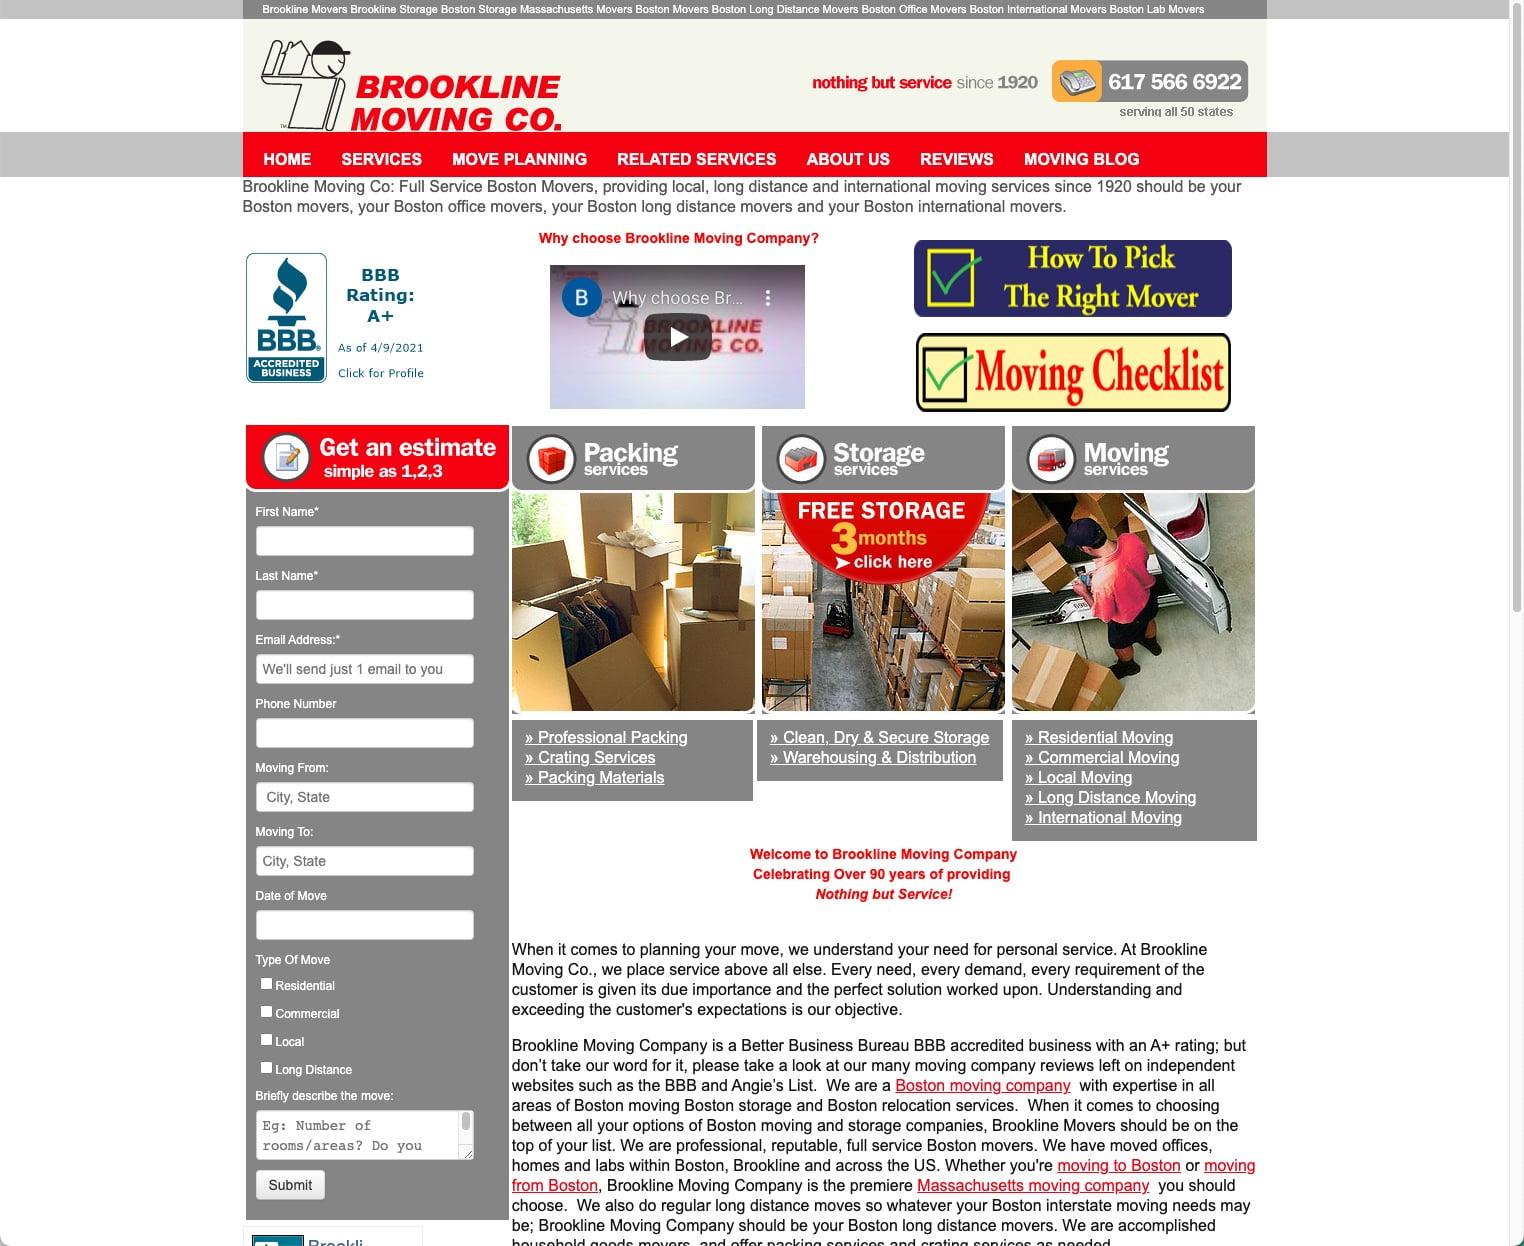 Brookline Moving Company